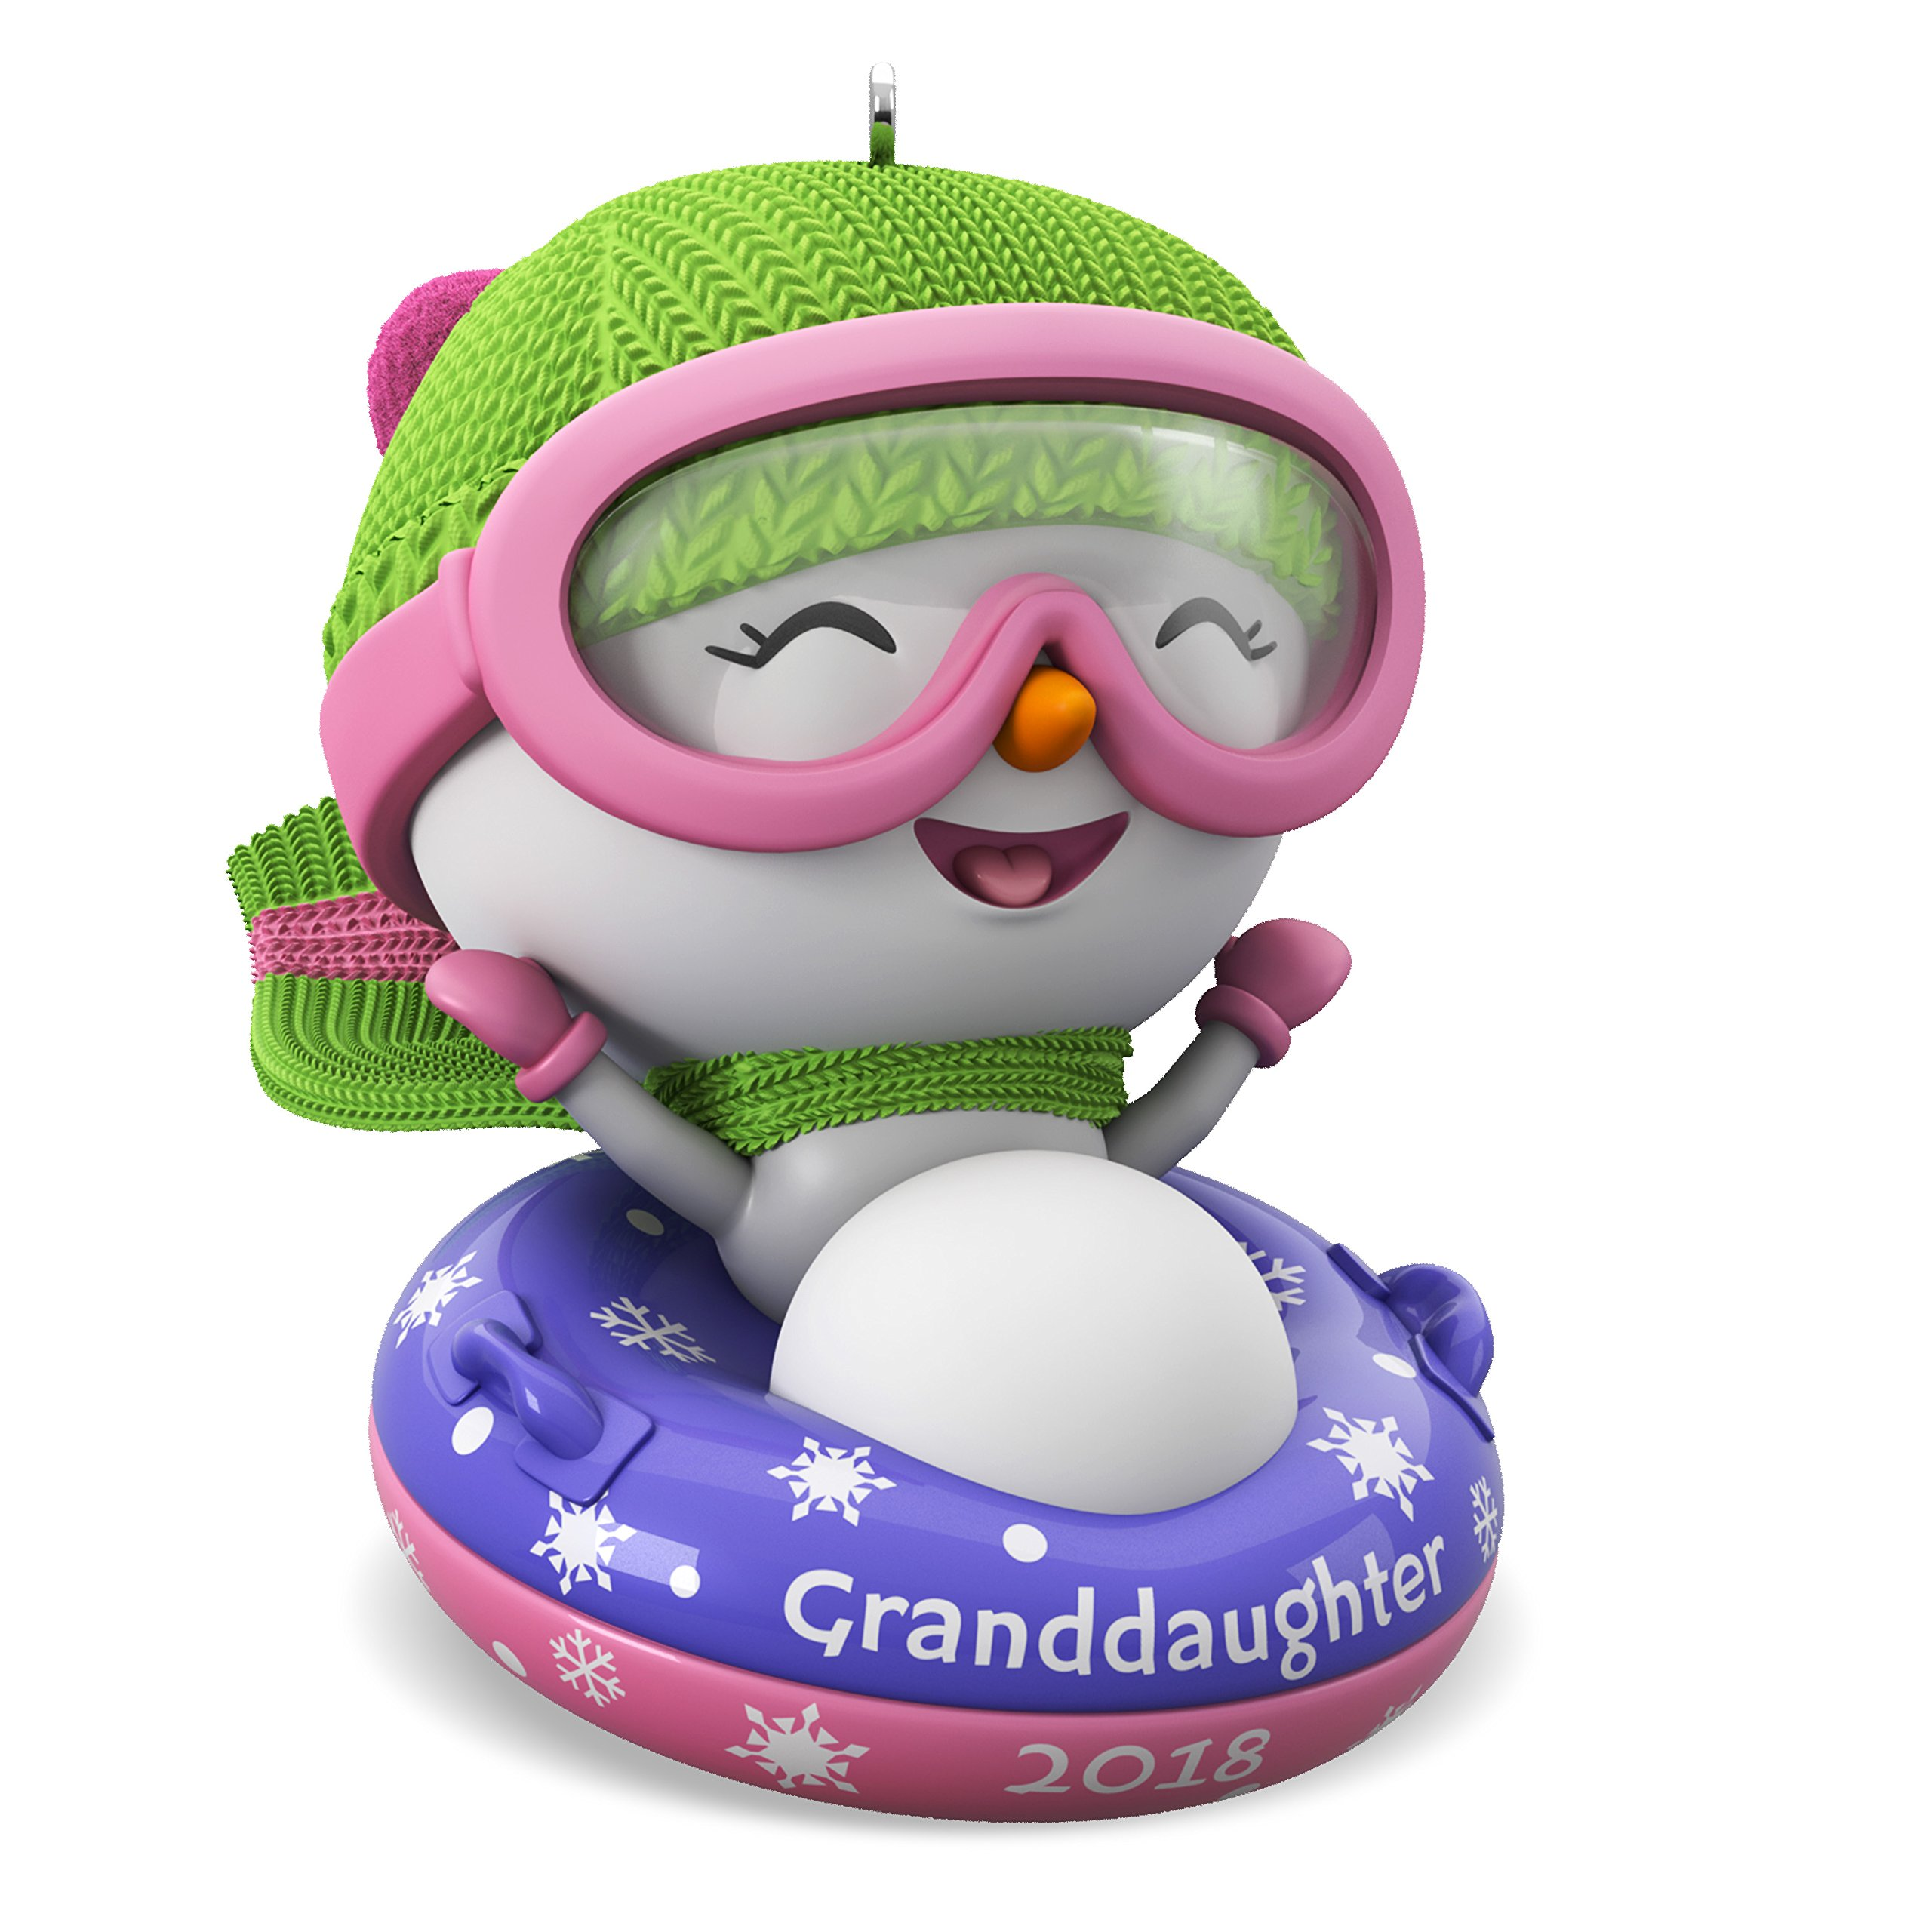 Hallmark Keepsake Christmas Ornament 2018 Year Dated, Granddaughter Snowman by Hallmark